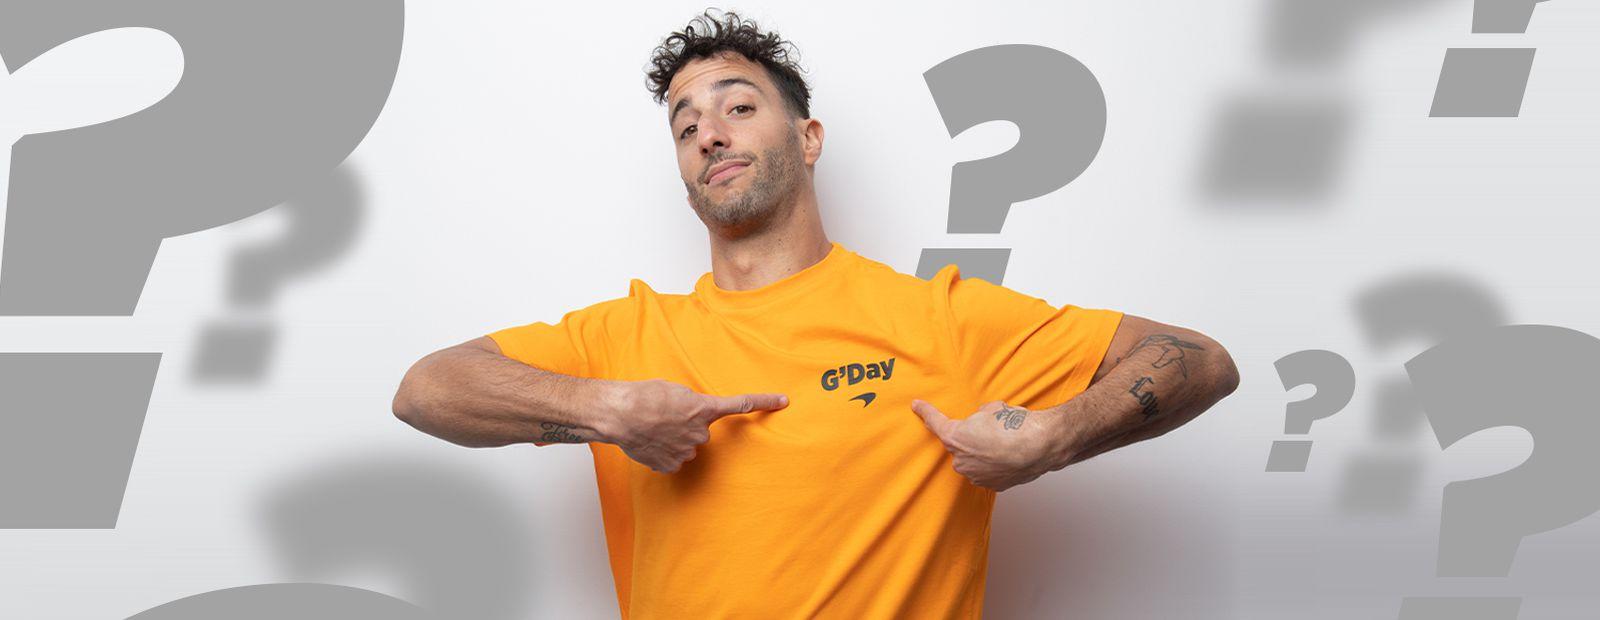 How well do you know Daniel Ricciardo?